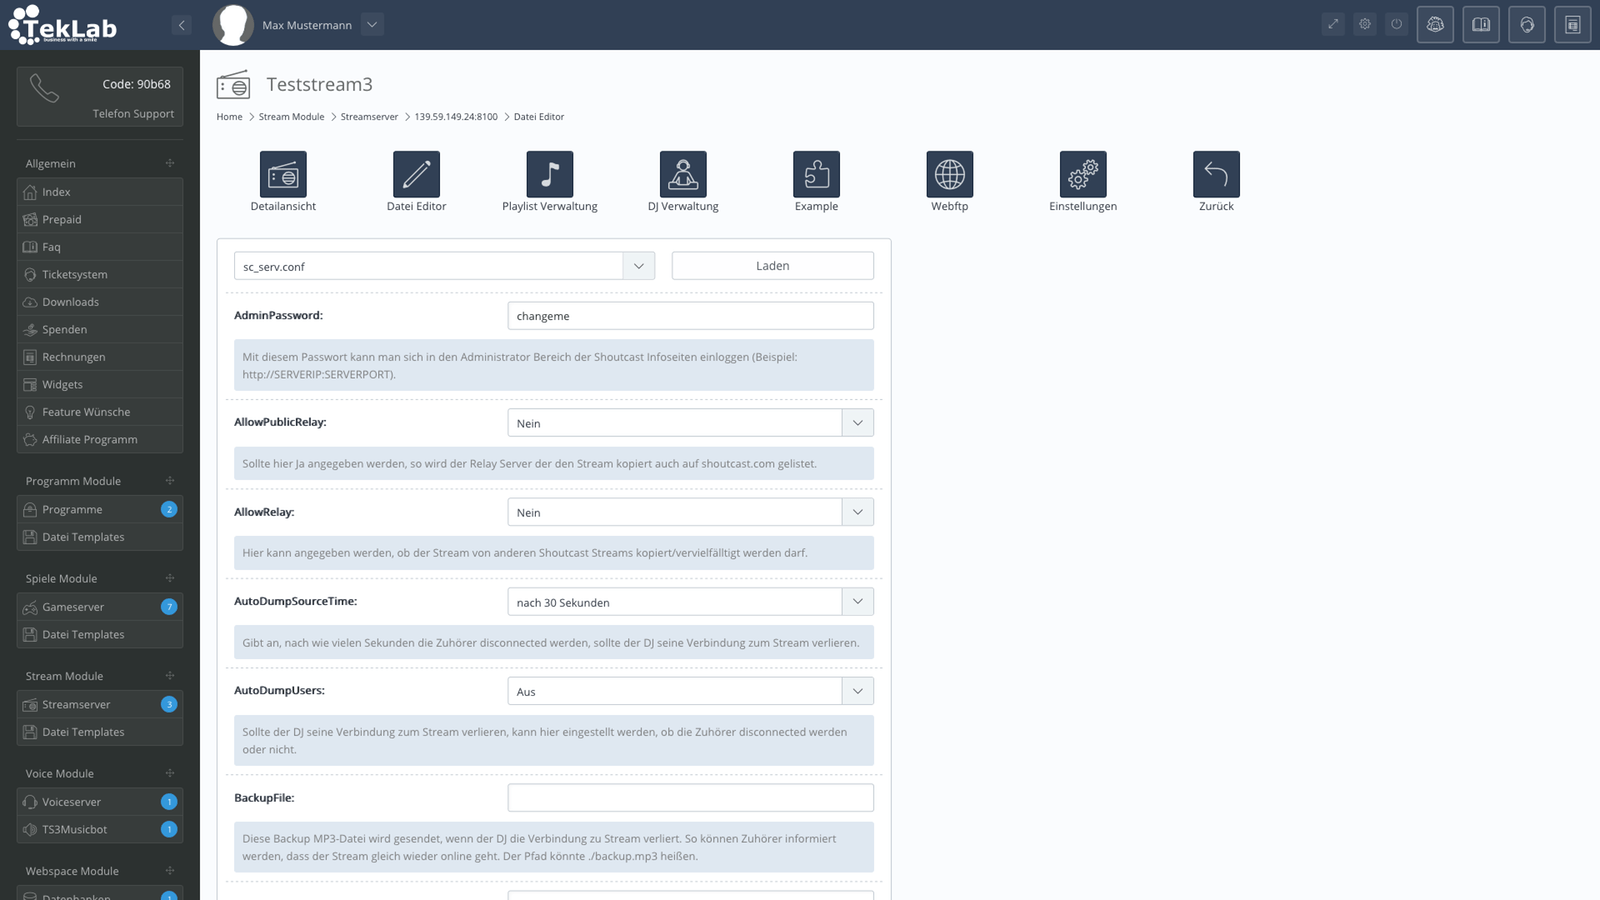 TekBASE Kundenbereich - Streamserver Editor